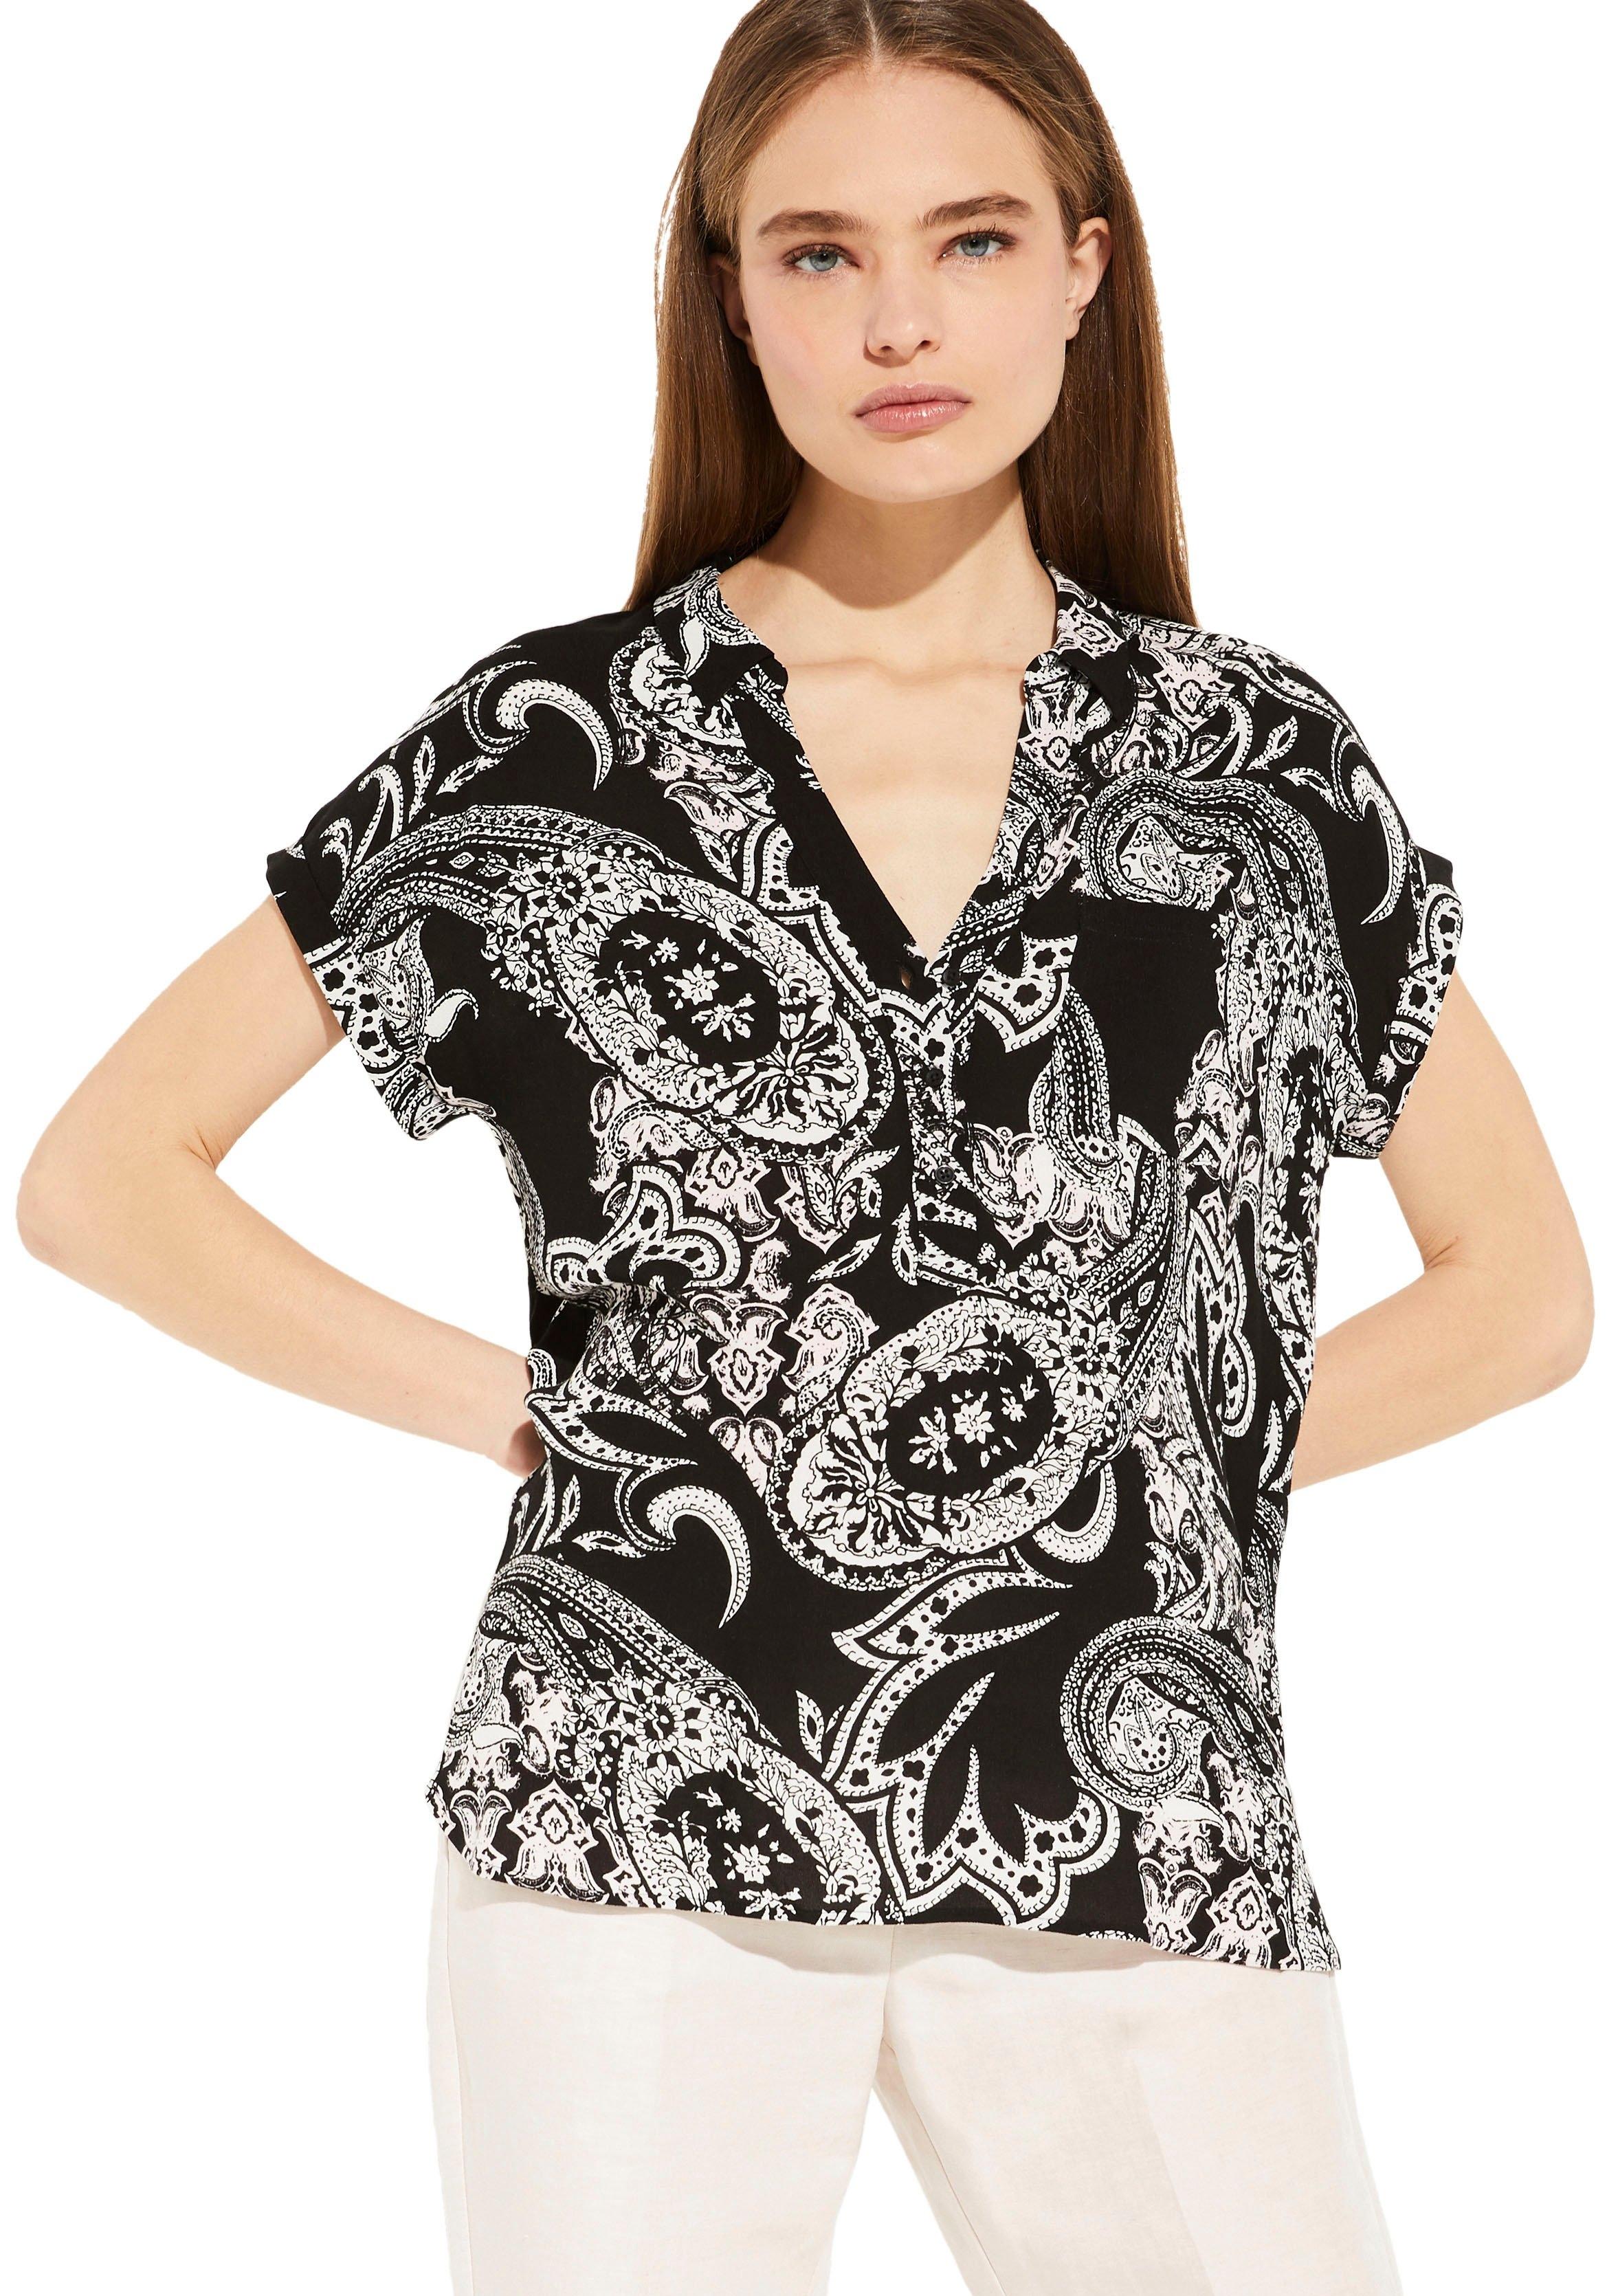 Comma gedessineerde blouse - verschillende betaalmethodes